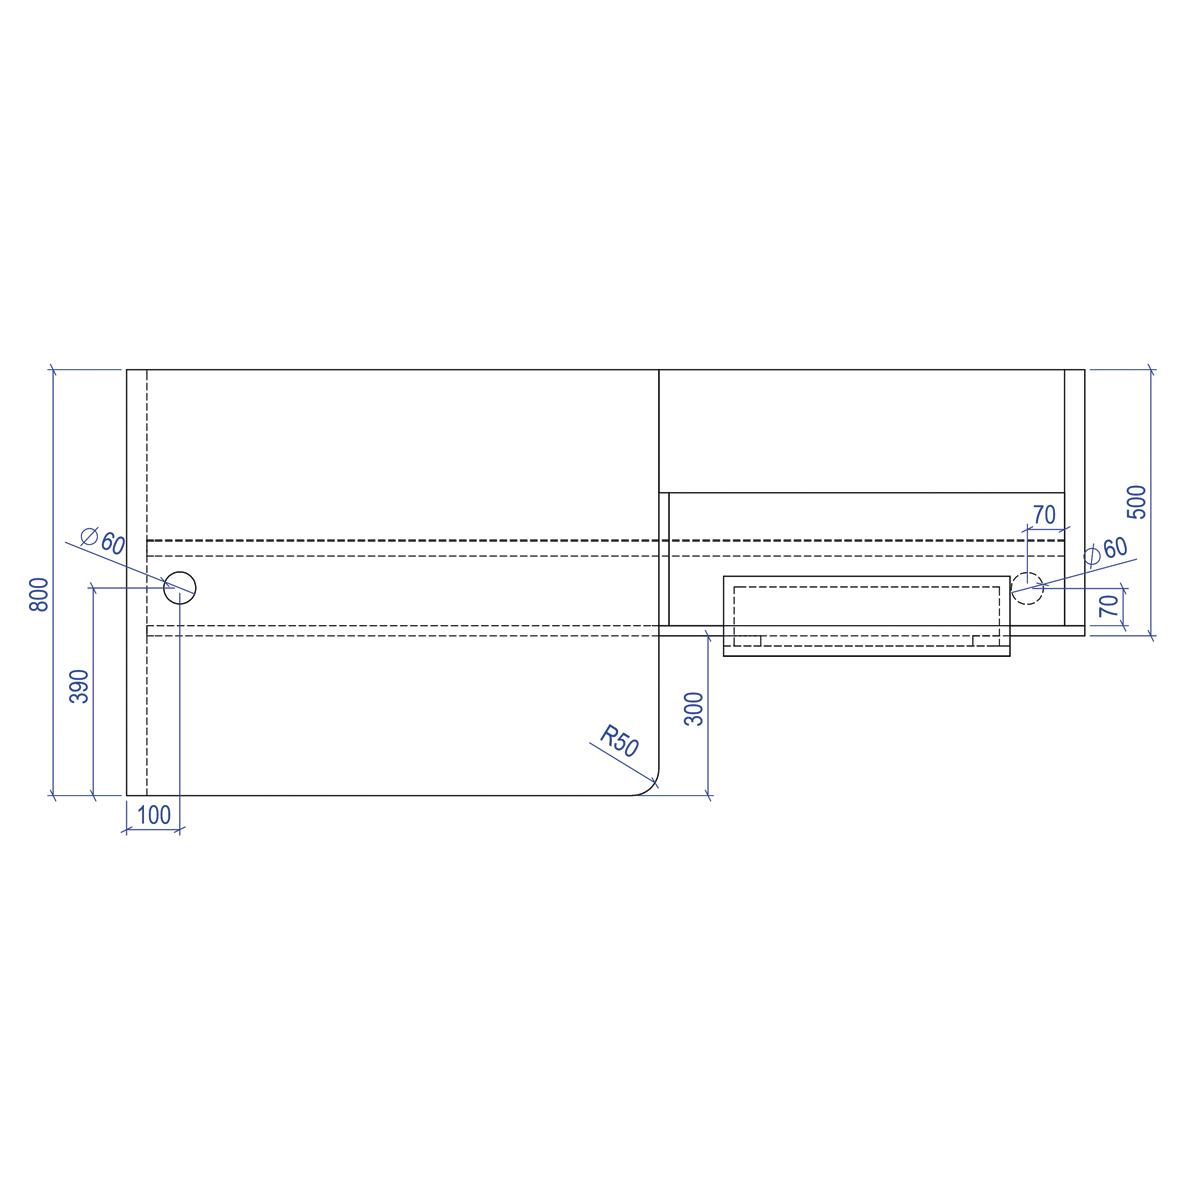 Schema de haut de la banque d'accueil avec dimensions